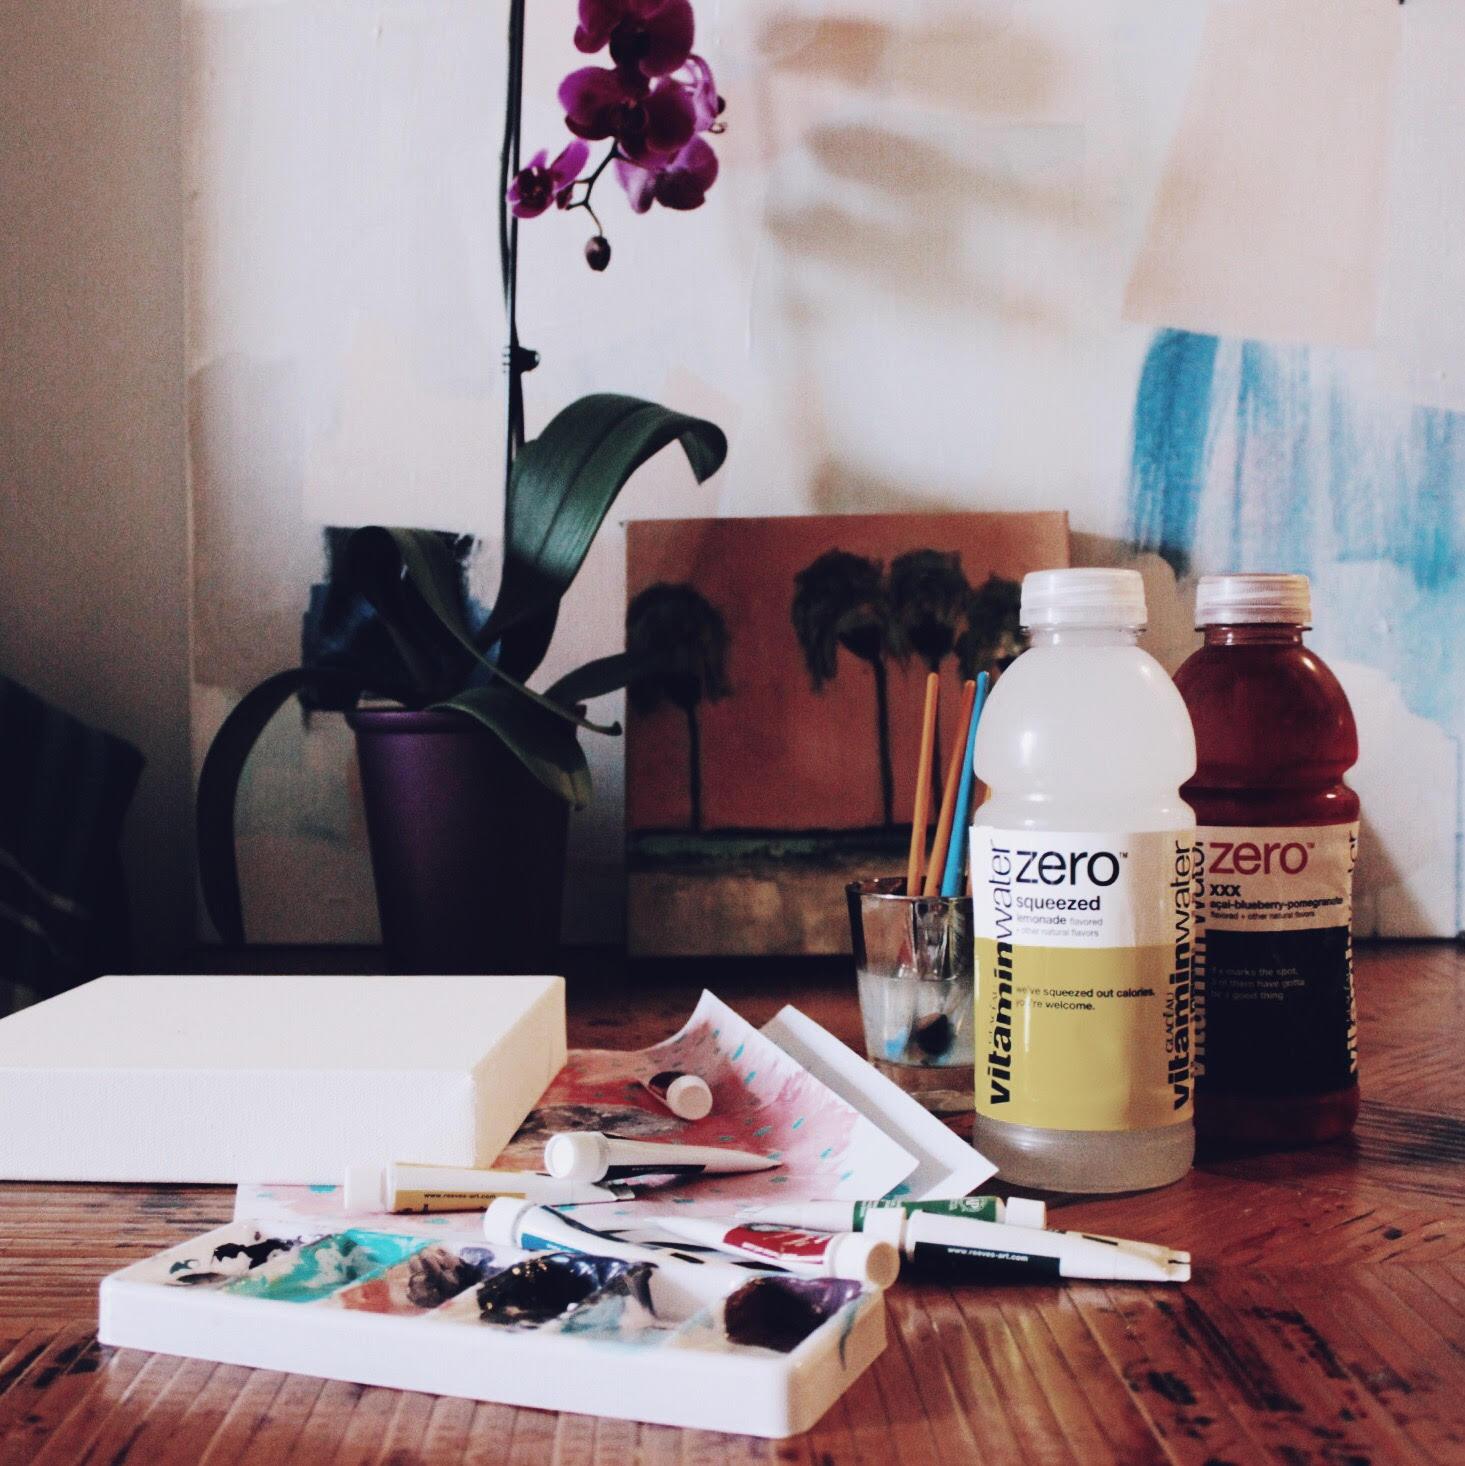 Lauren's art project - I love color coordinated hydration.